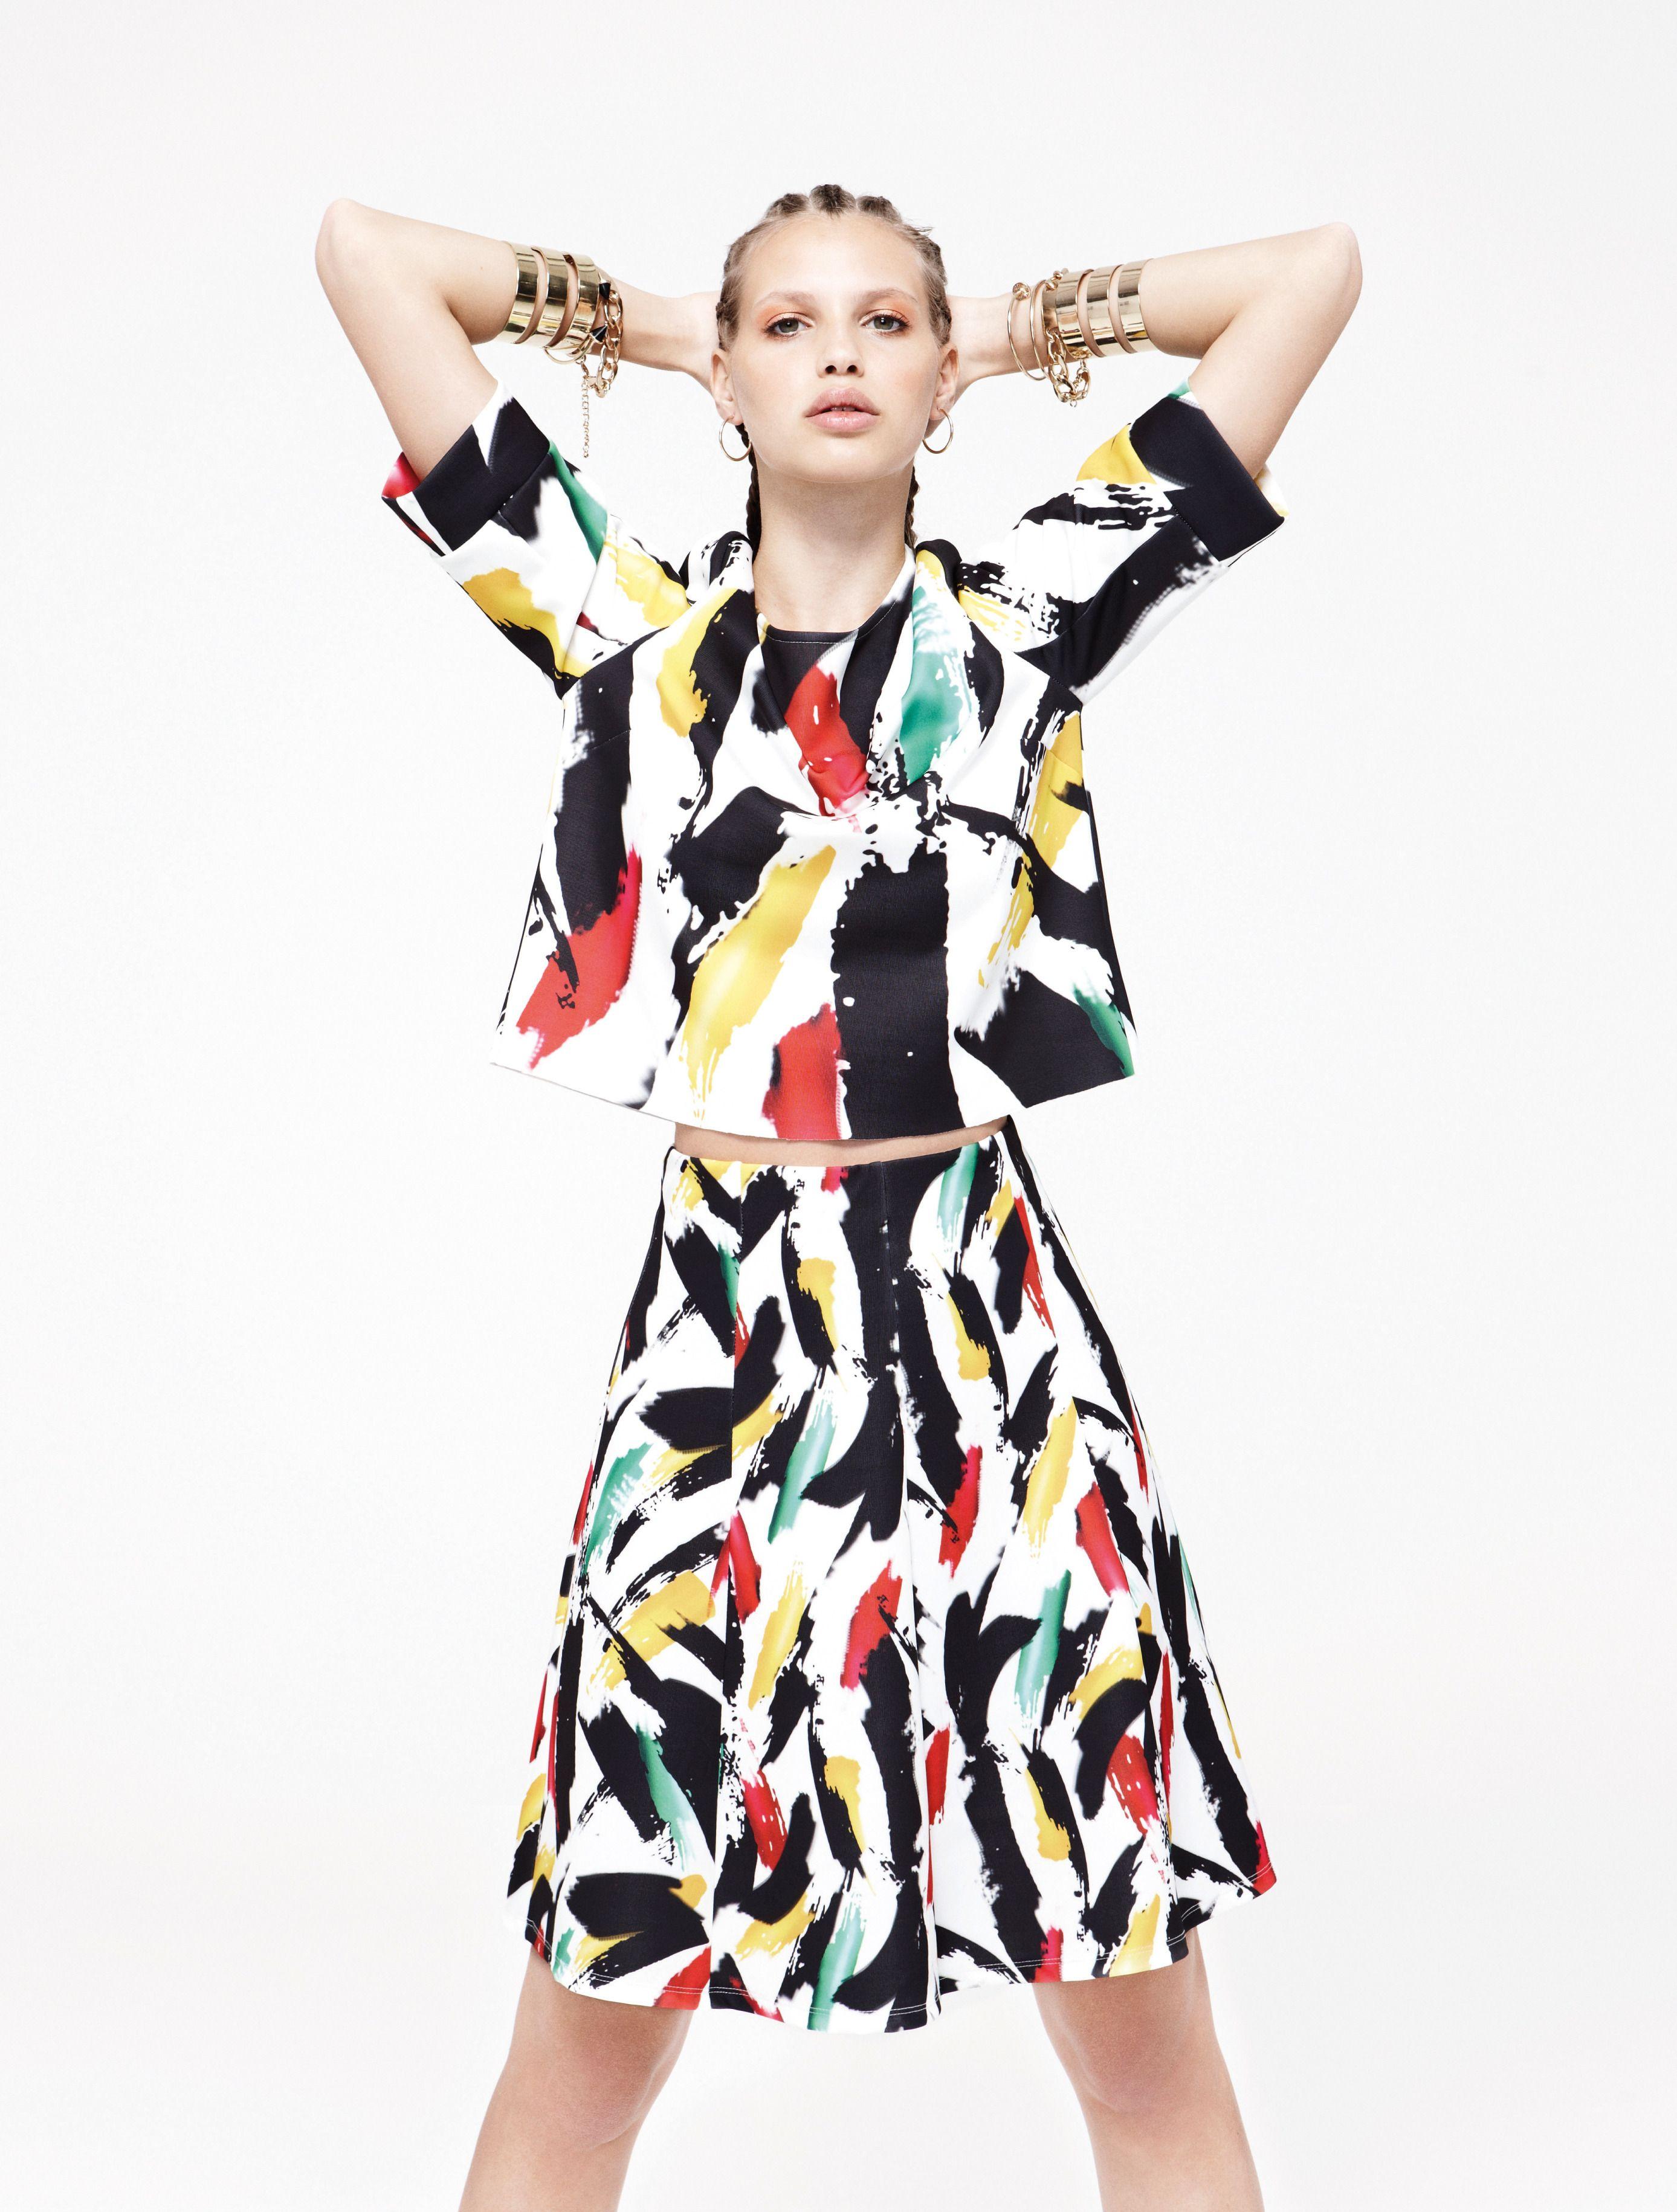 714b4b6044c PRIMARK SS/14 | PRIMARK WOMEN SS/14 LOOKBOOK | Summer fashion trends ...